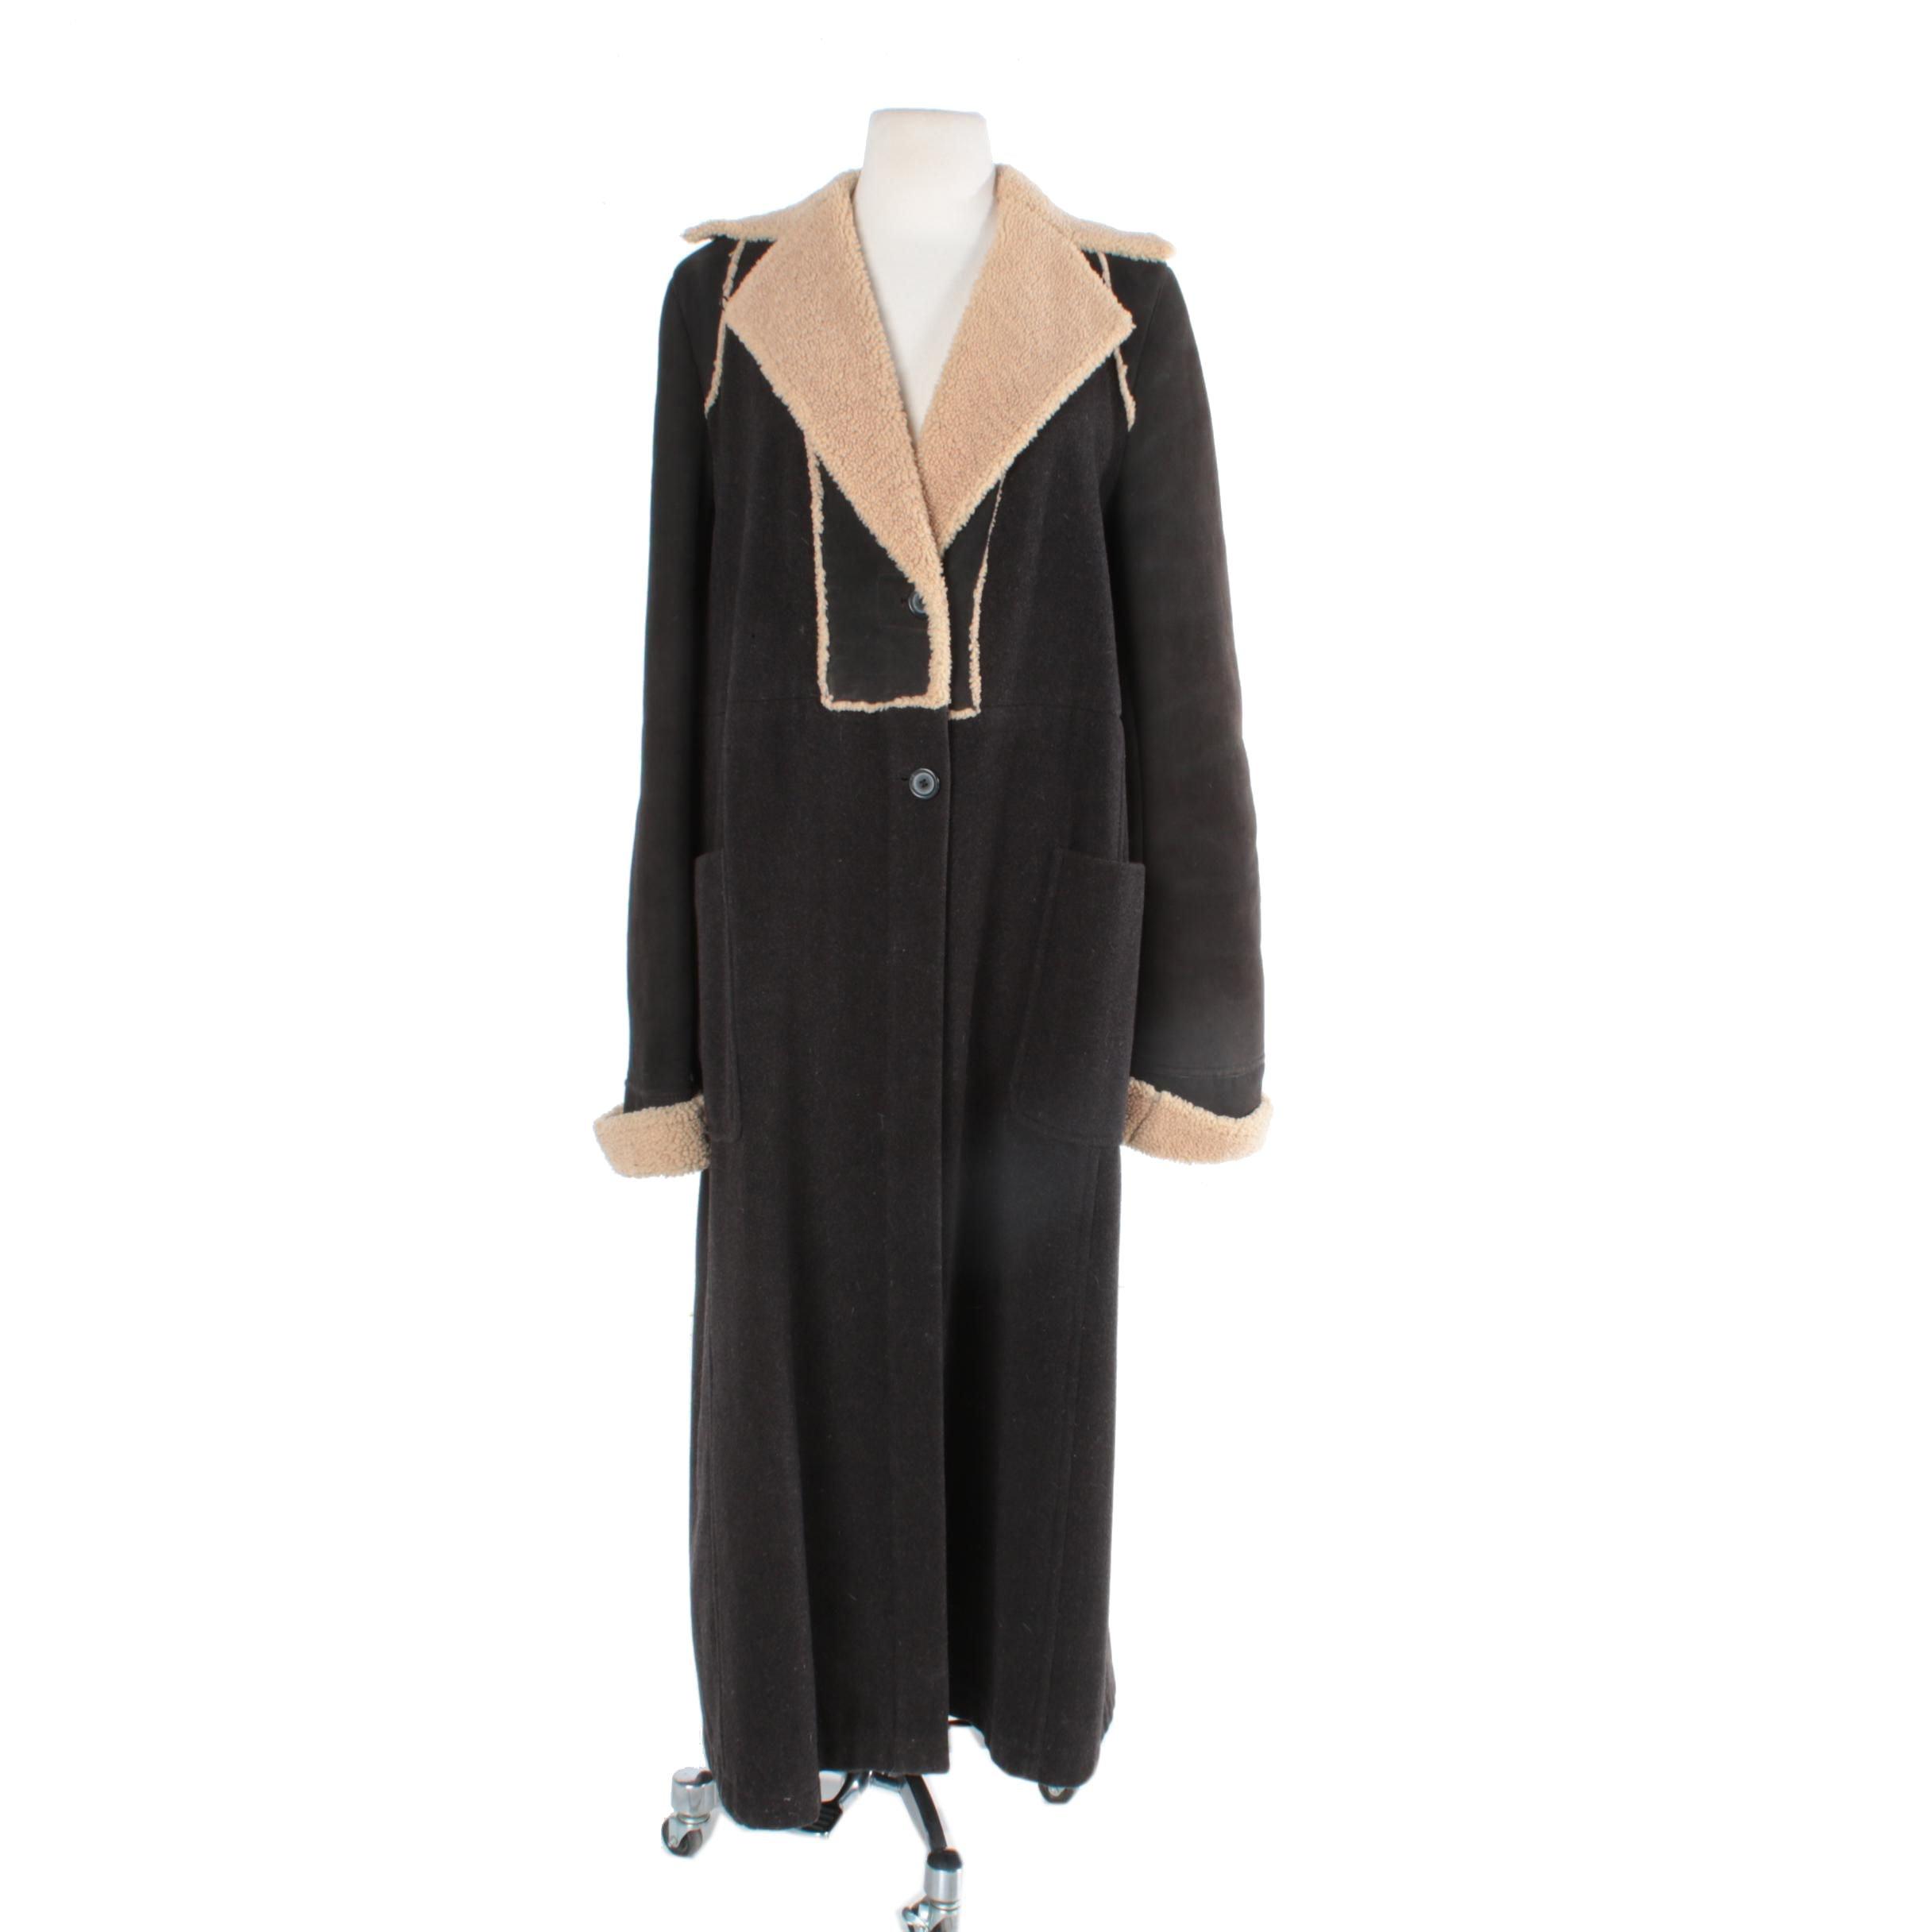 Dries Van Noten Brown Wool and Faux Shearling Coat